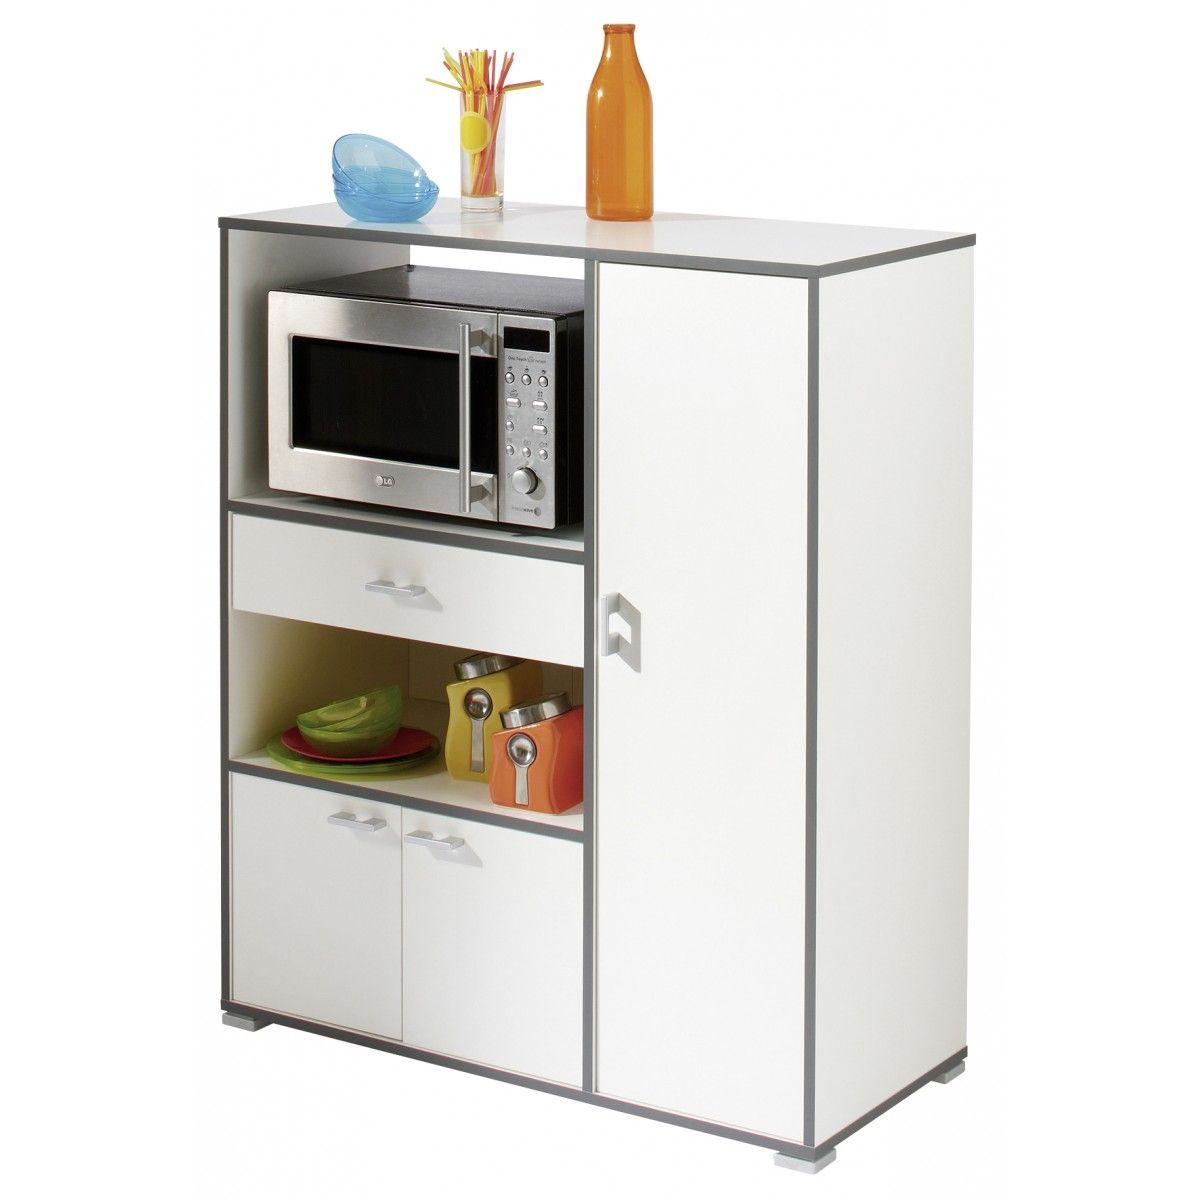 Mueble microondas buzz buffet pinterest cozinha for Mueble auxiliar microondas